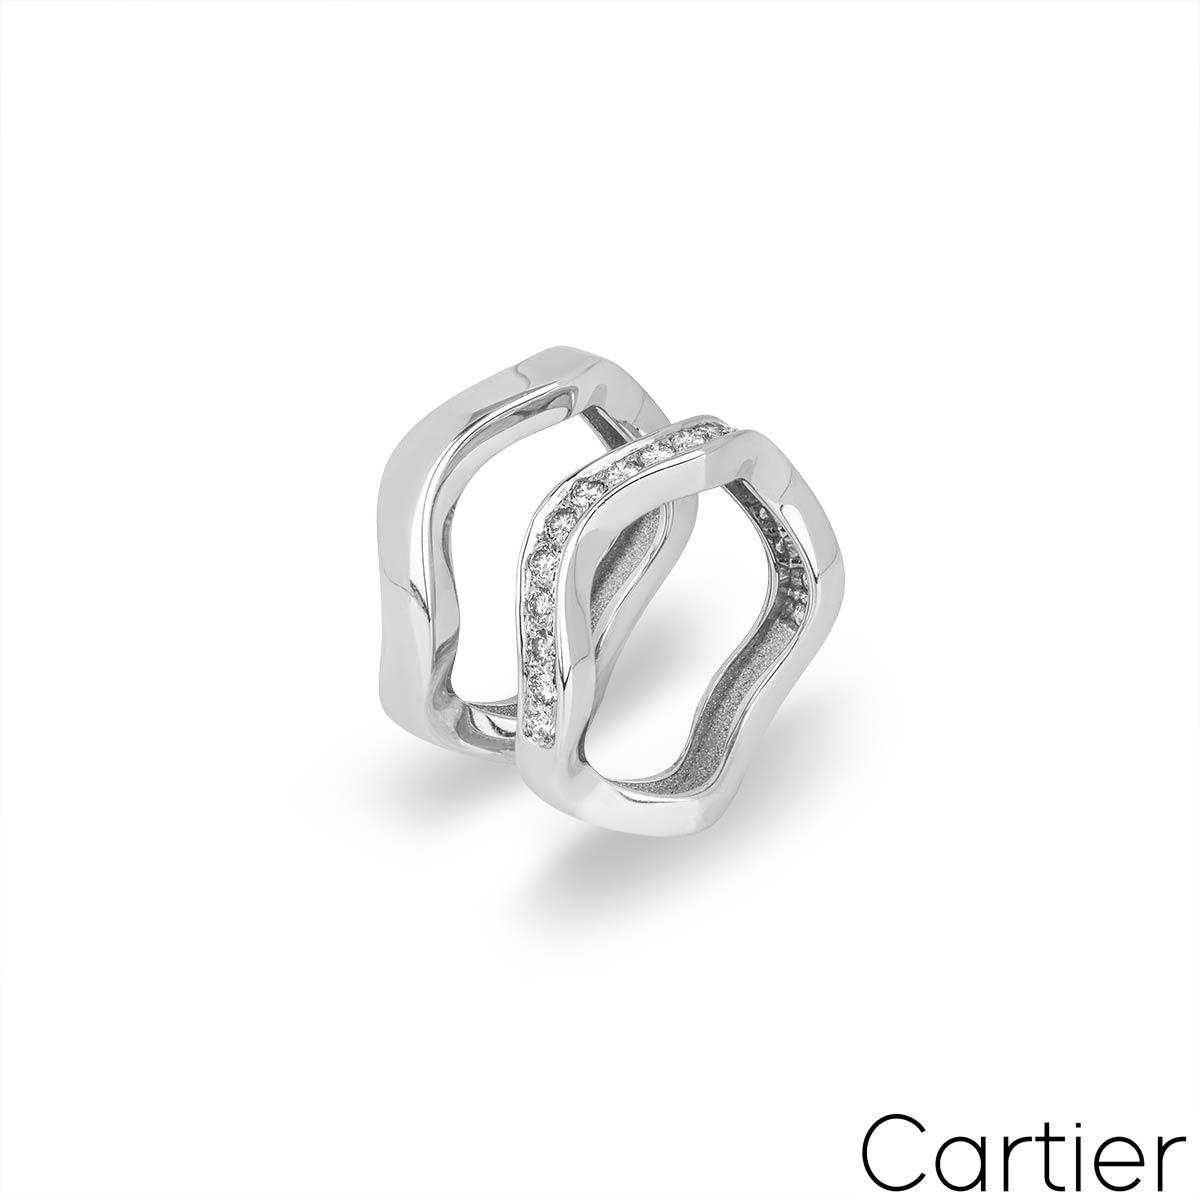 Cartier Stacker Rings